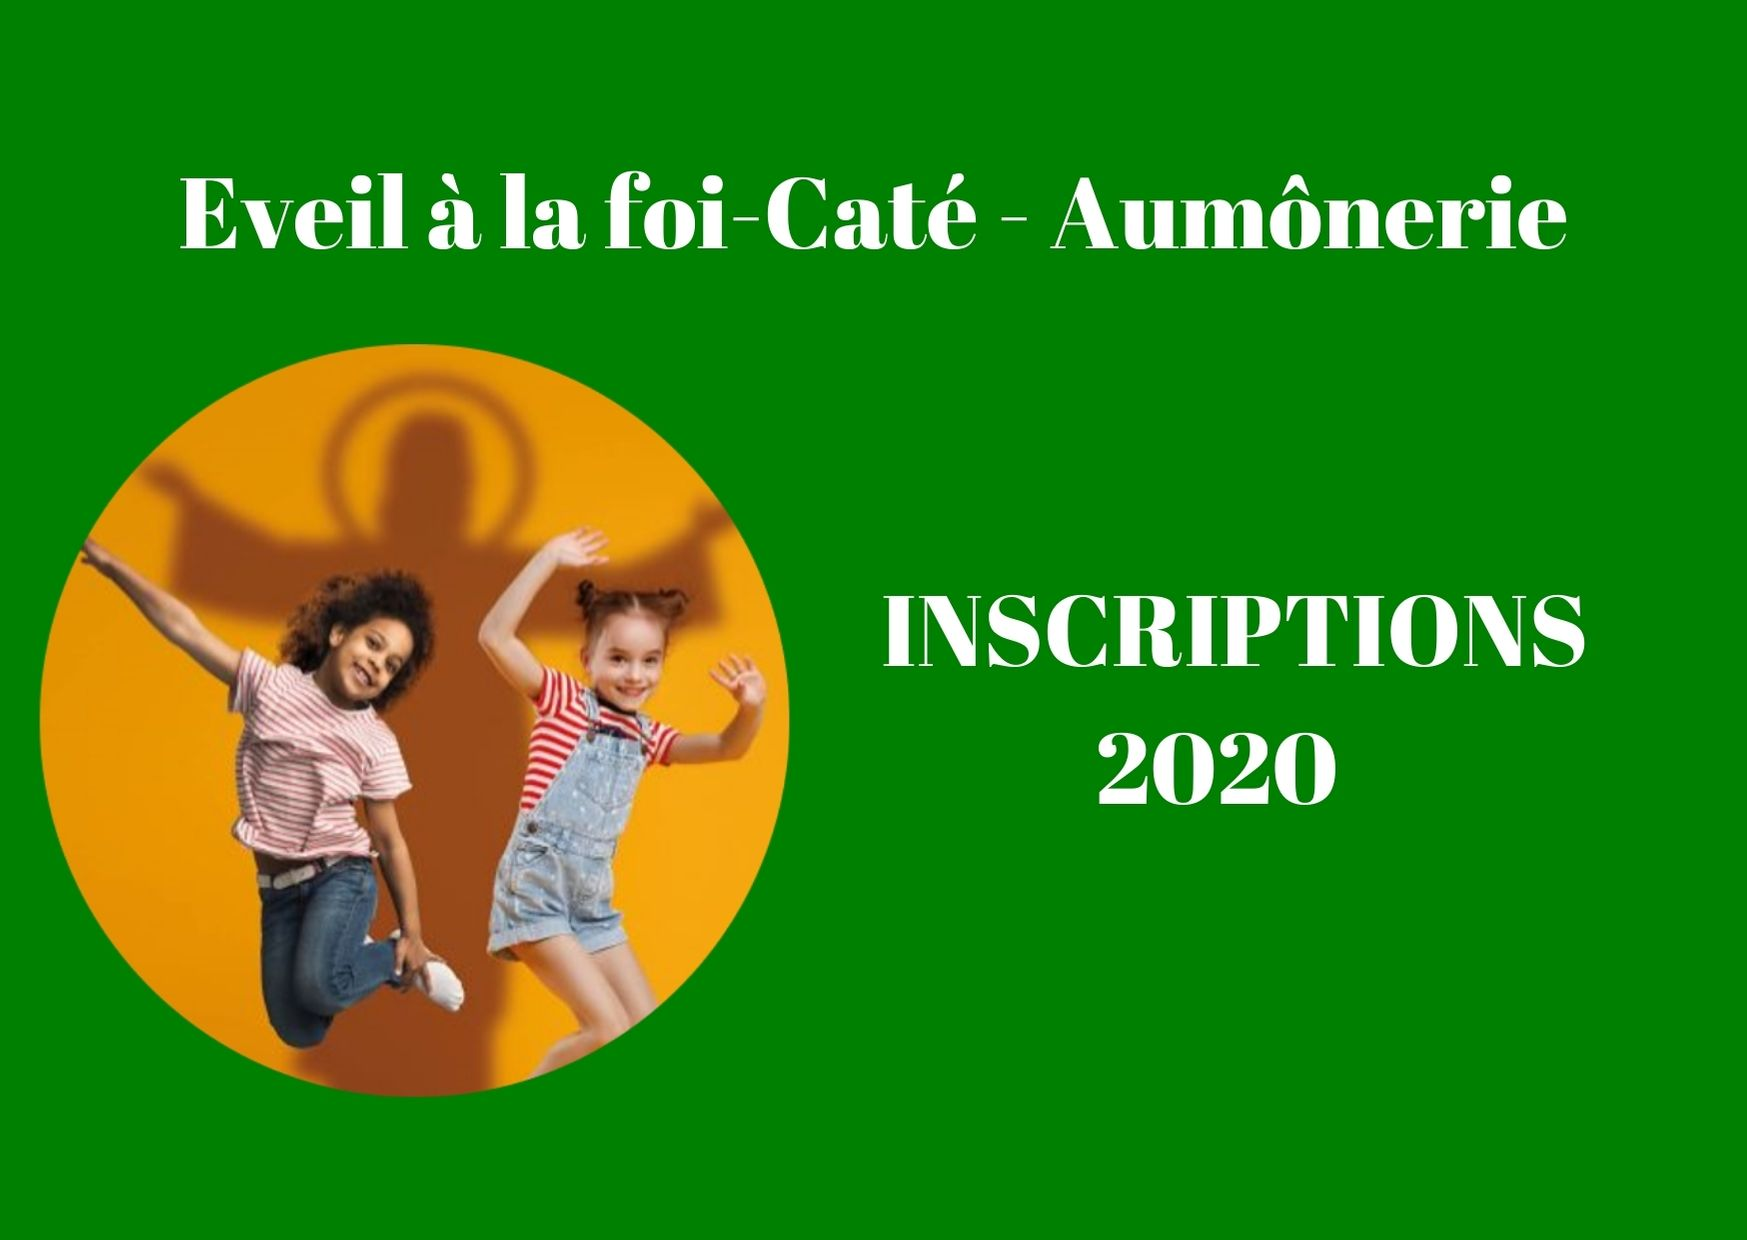 Inscriptions 2020